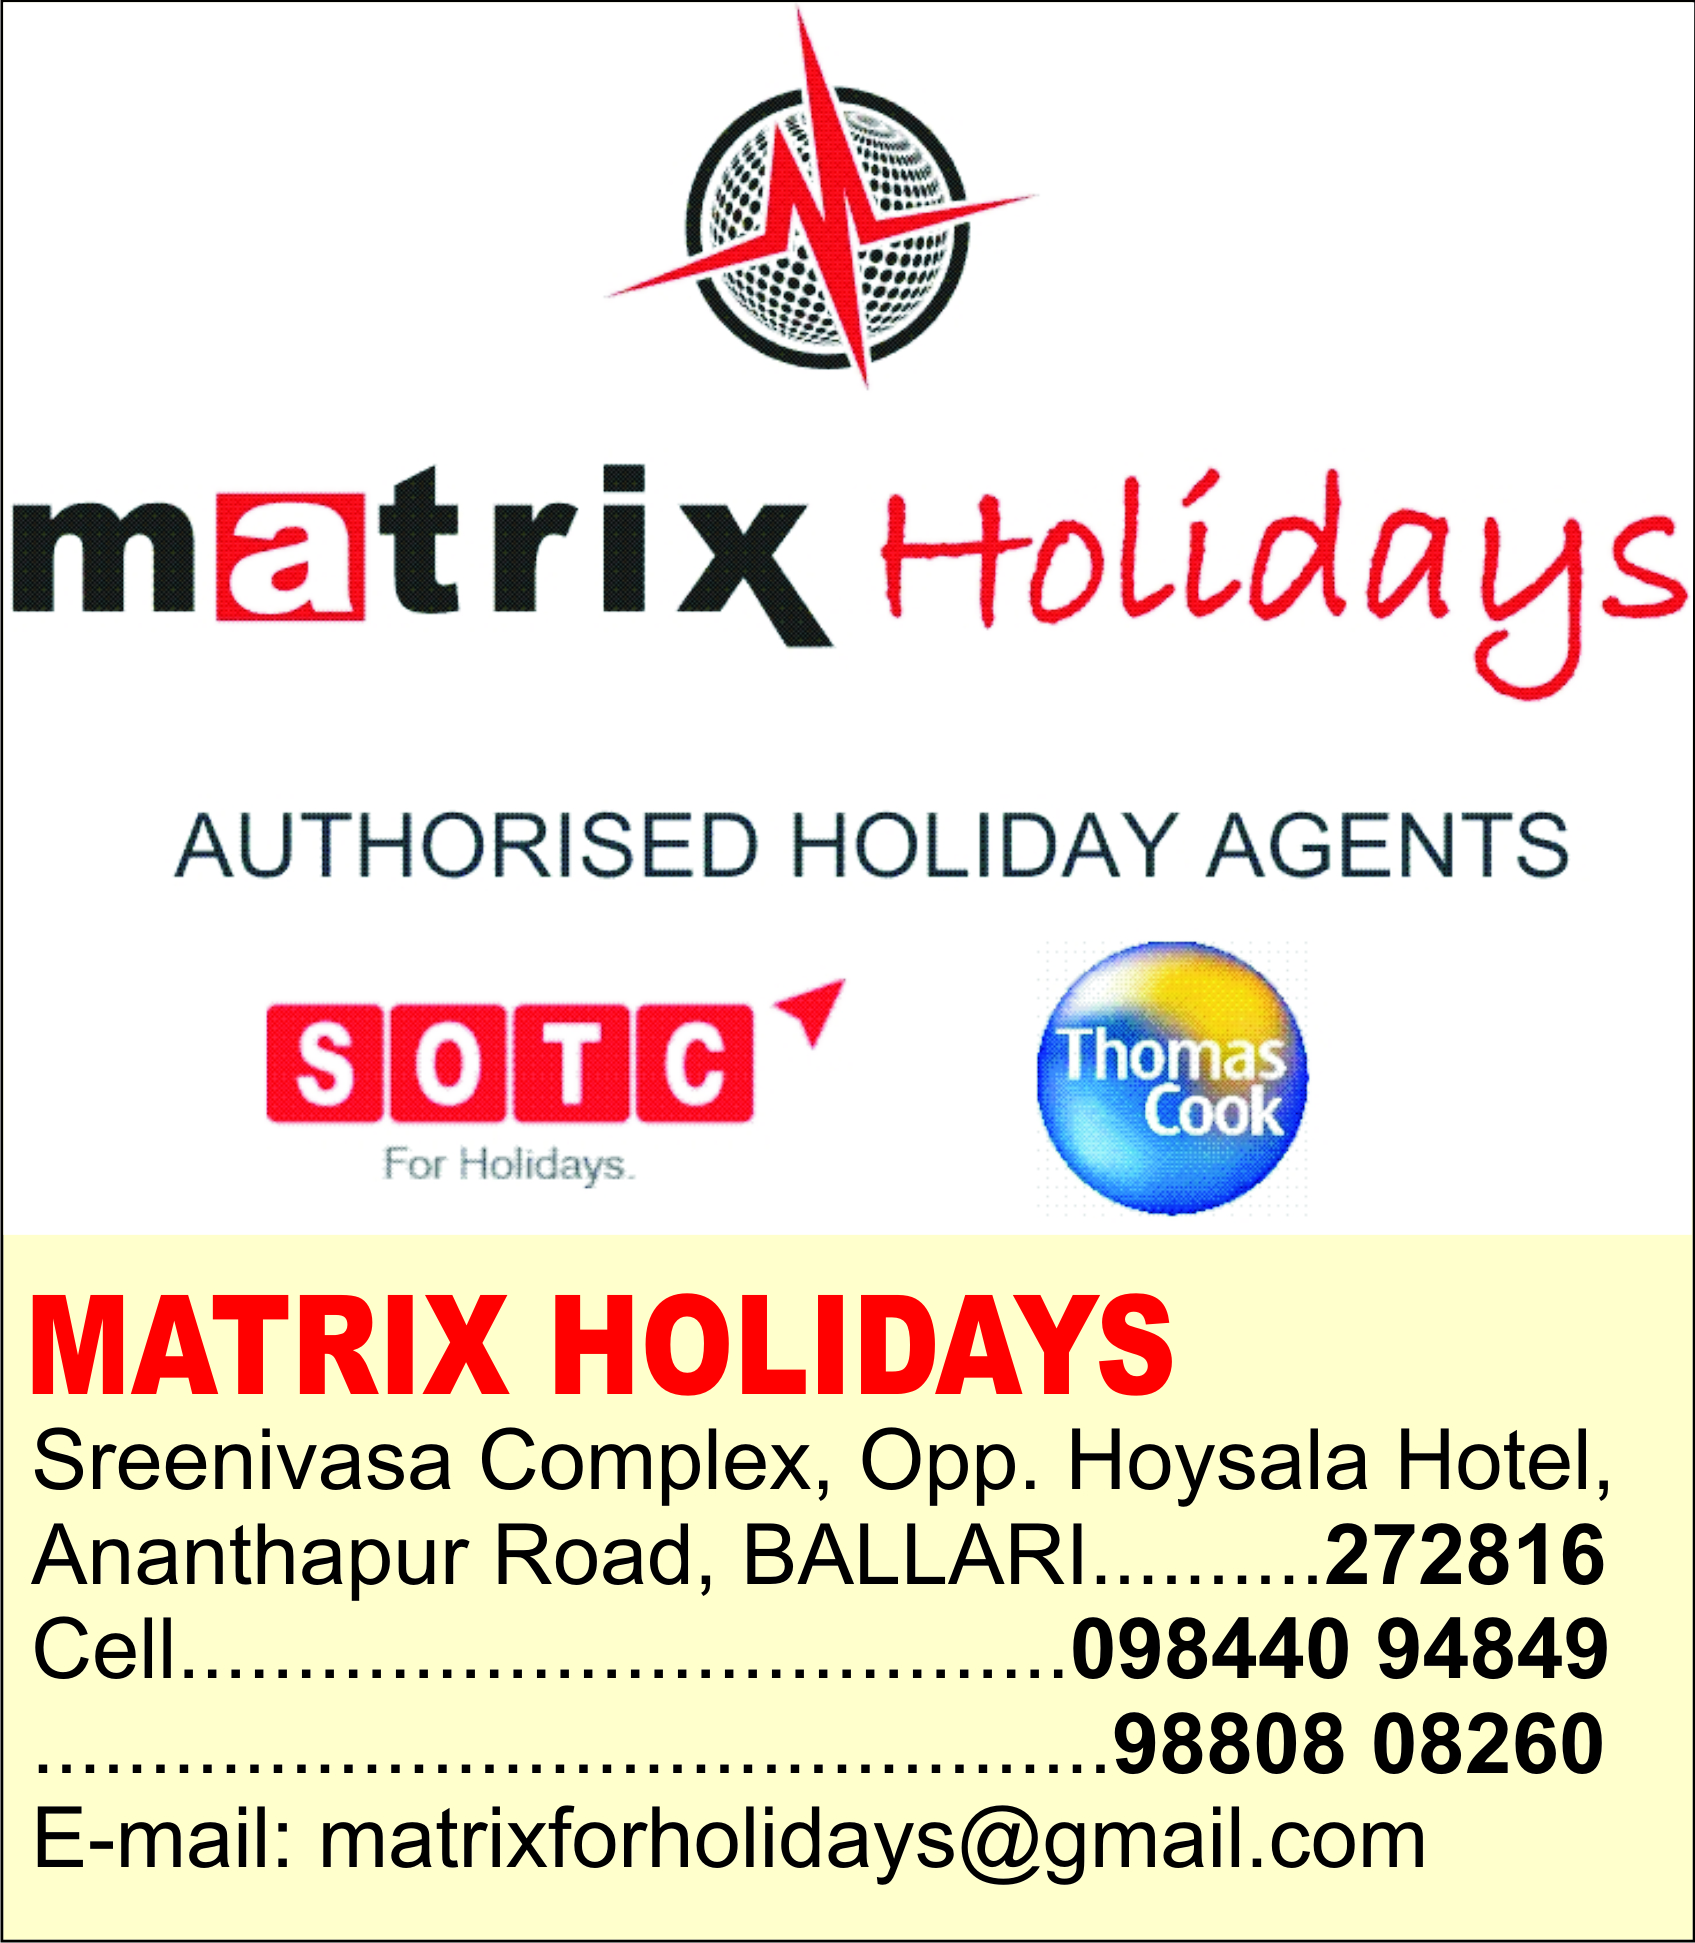 MATRIX HOLIDAYS